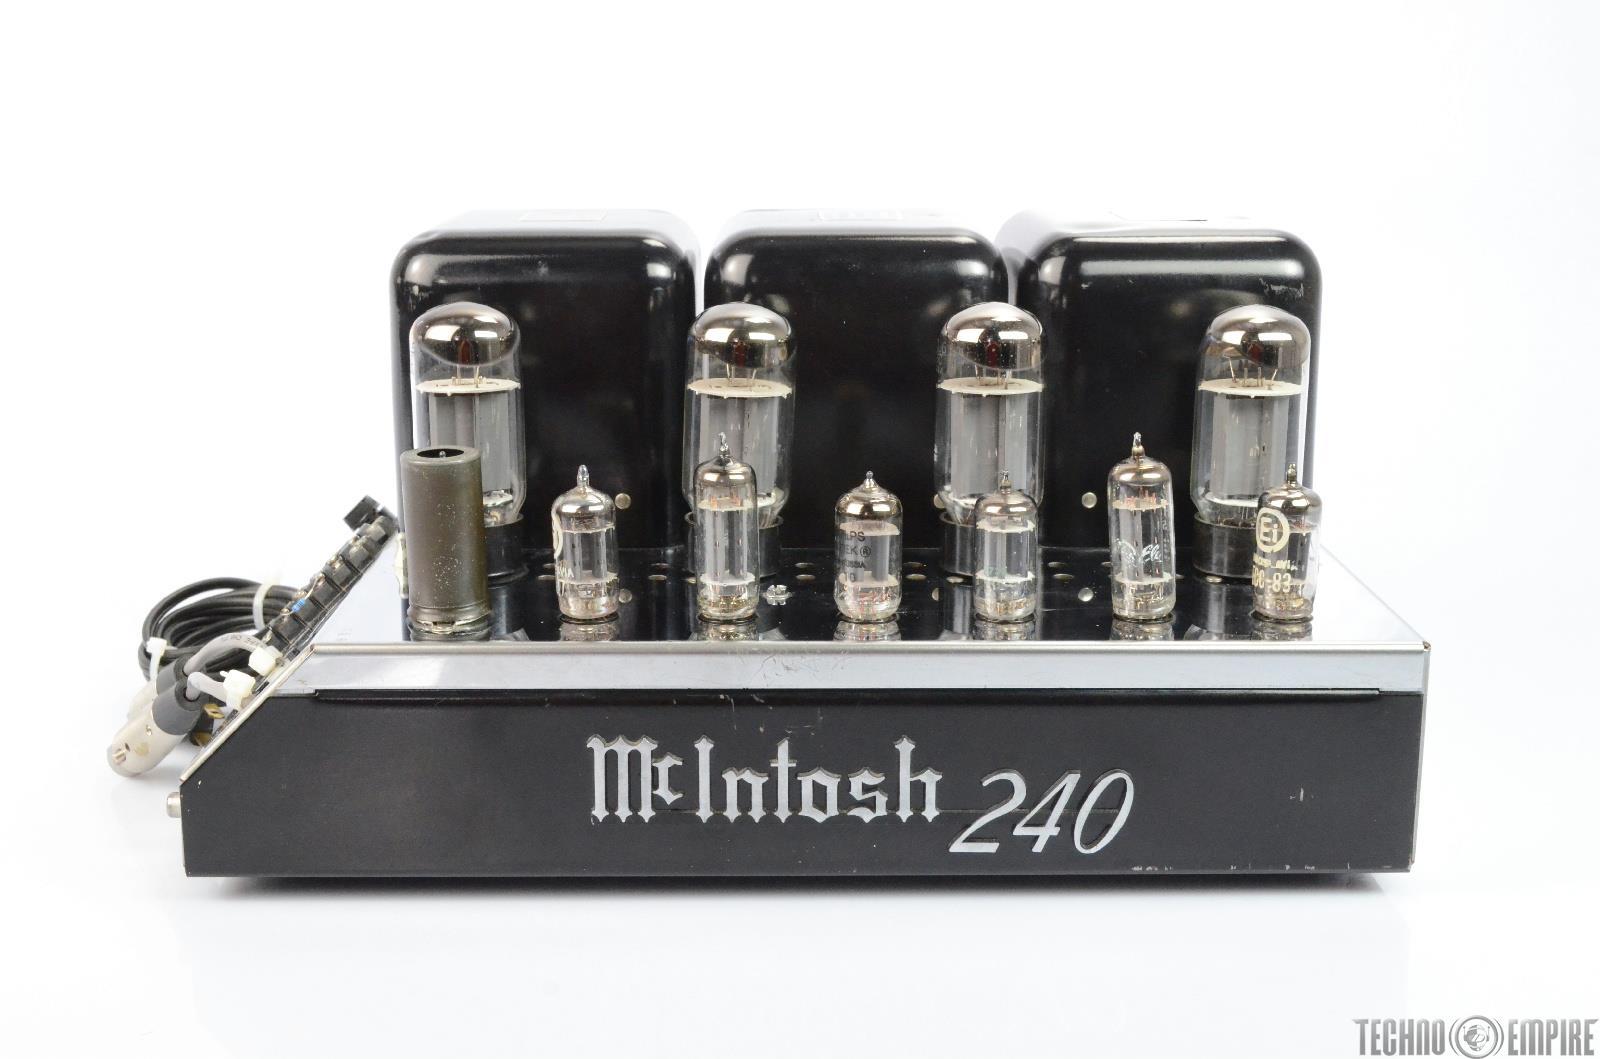 McIntosh MC240 Tube Power Amplifier XLR Balanced VERY CLEAN #25843